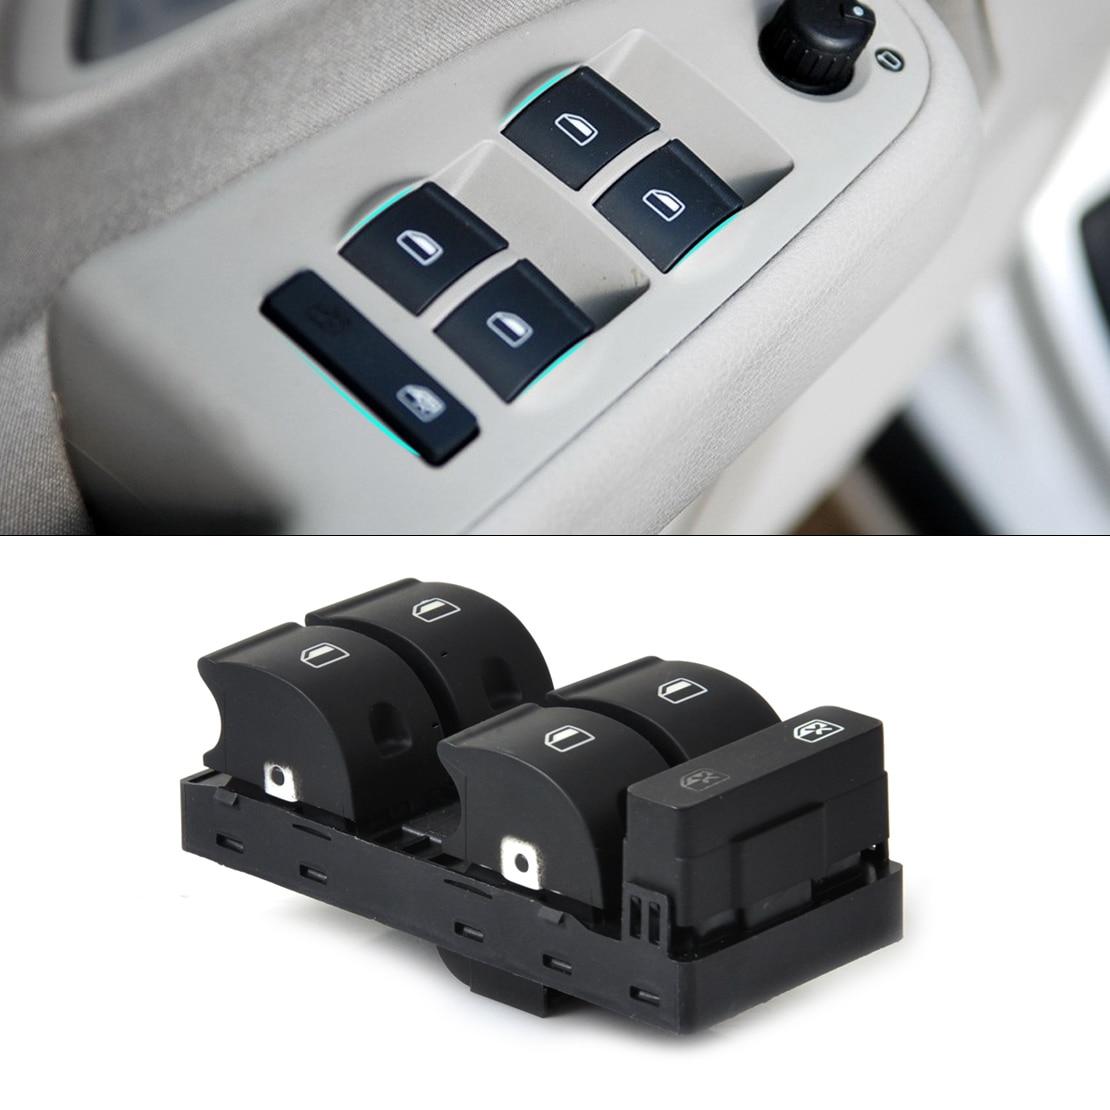 DWCX 8ED959851 8ED959851B Master Power Window Switch Panel For Audi A4 B6 B7 Sedan 2002 2003 2004 2005 2006 2007 2008